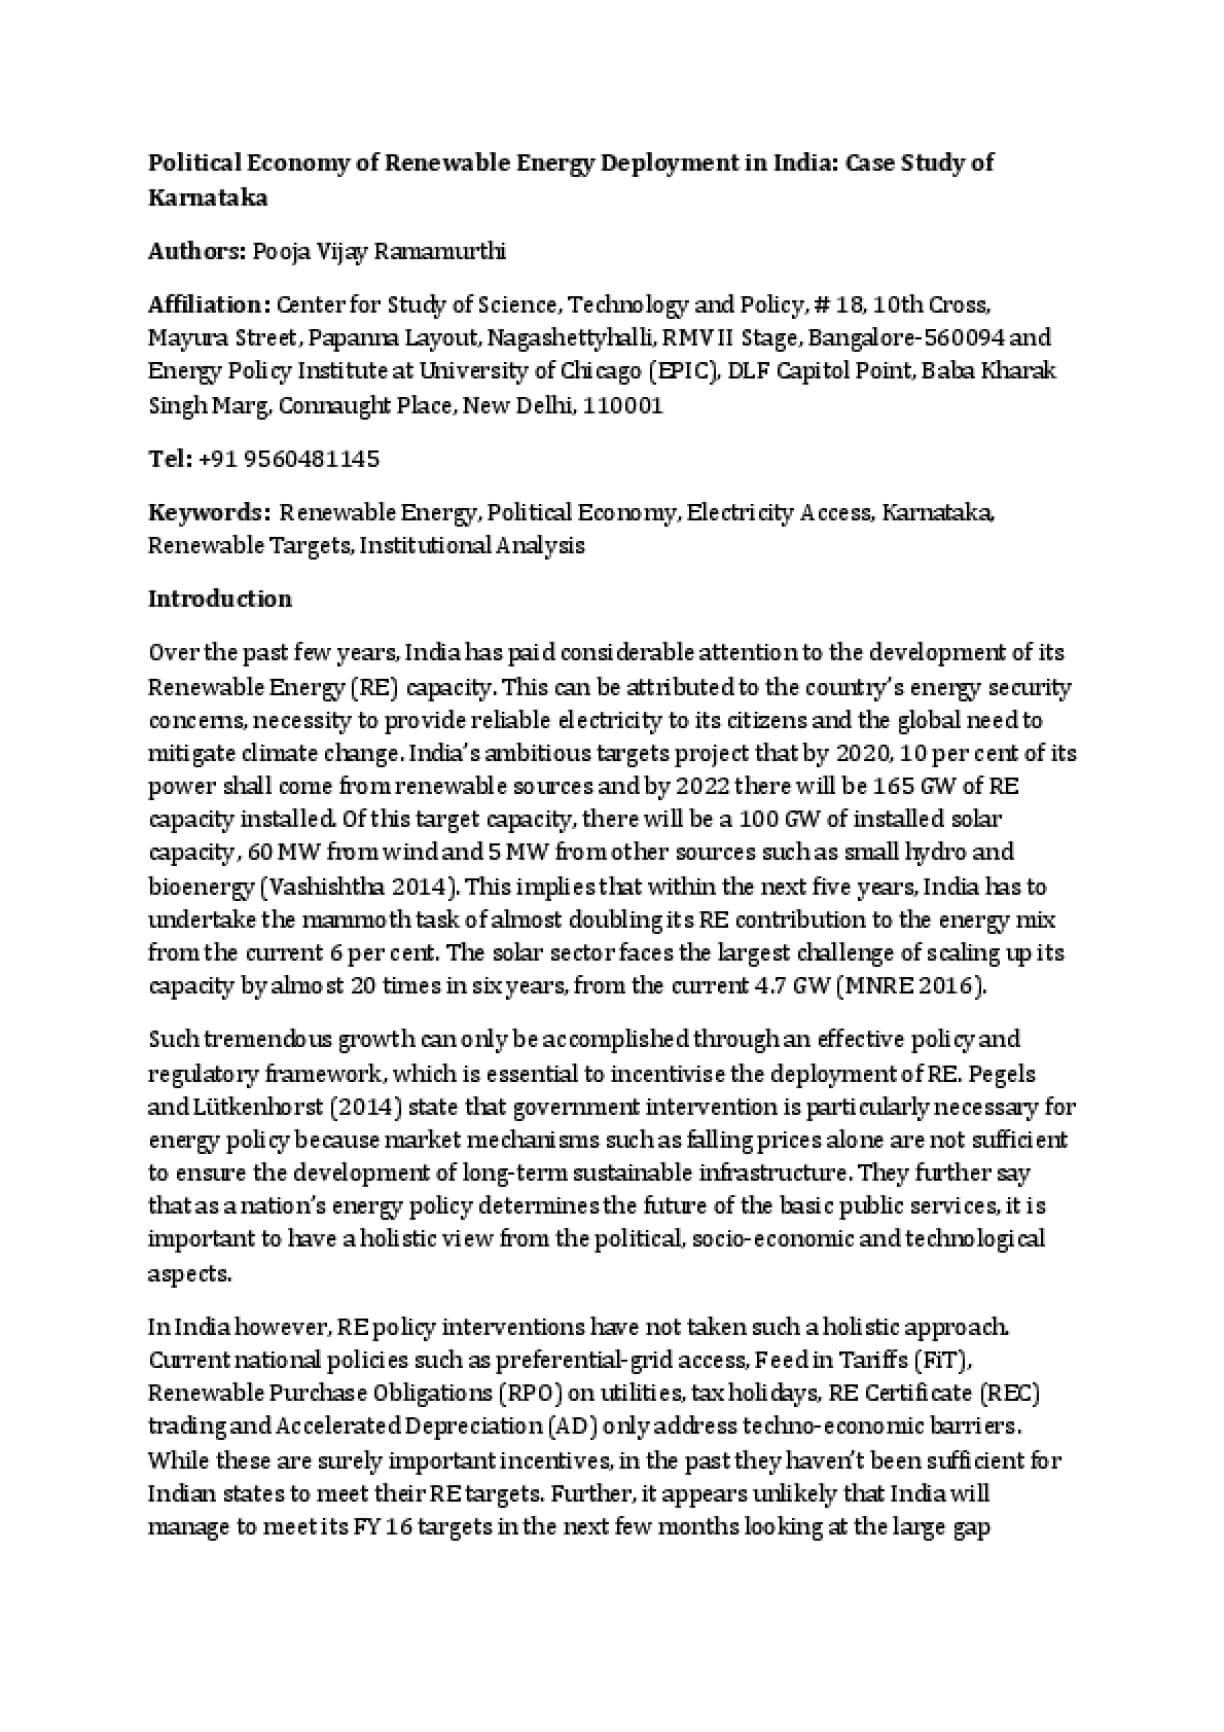 Political Economy of Renewable Energy Deployment in India